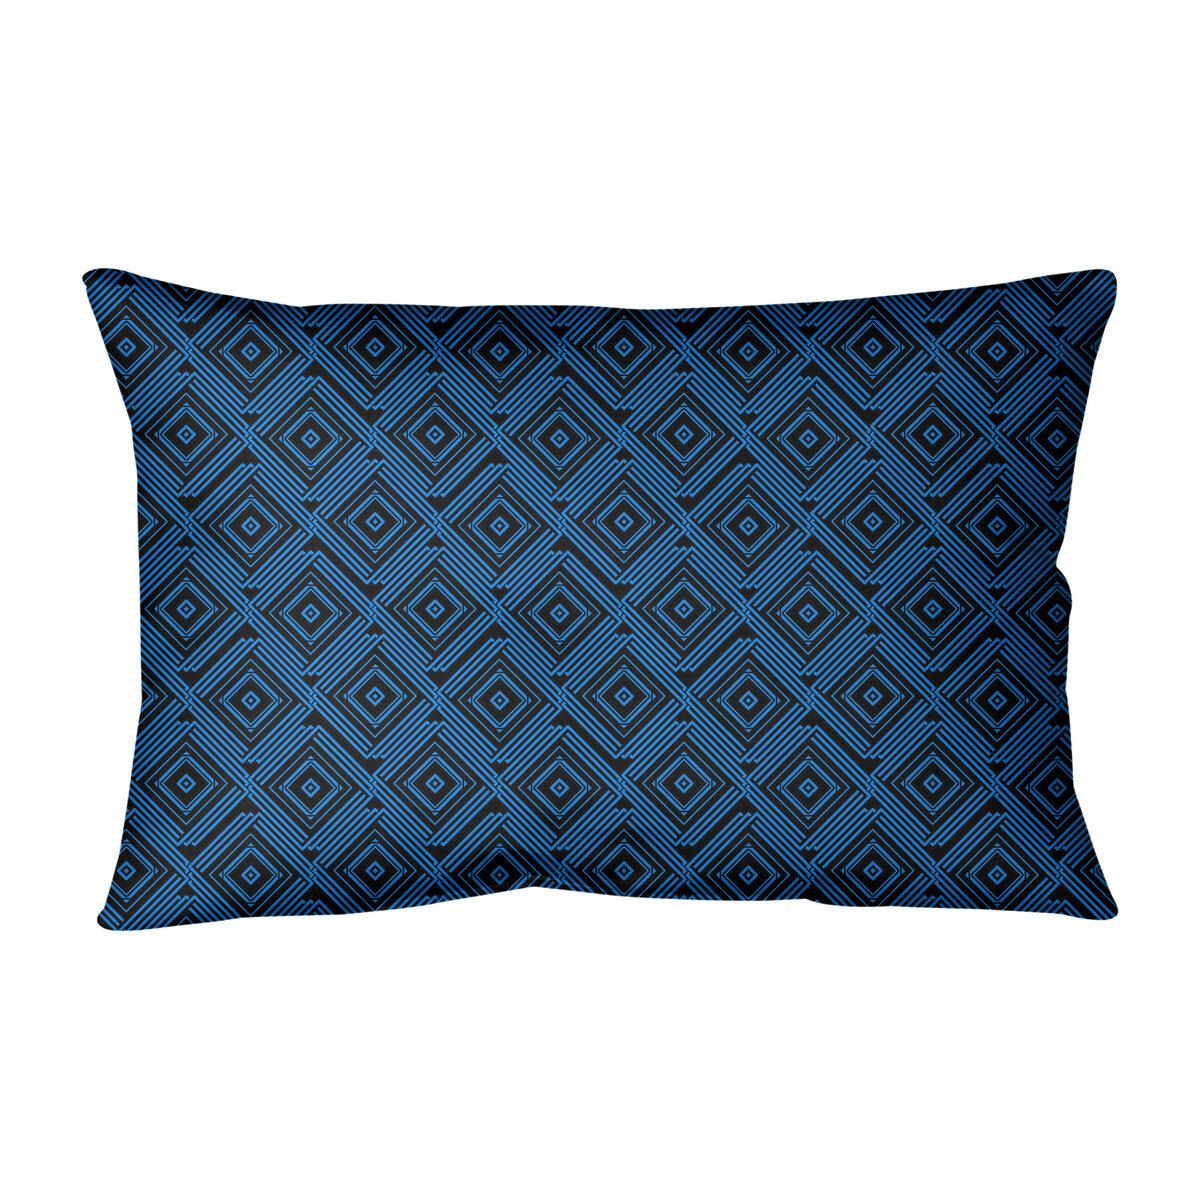 East Urban Home Mcguigan Maze Rectangular Cotton Pillow Cover Wayfair